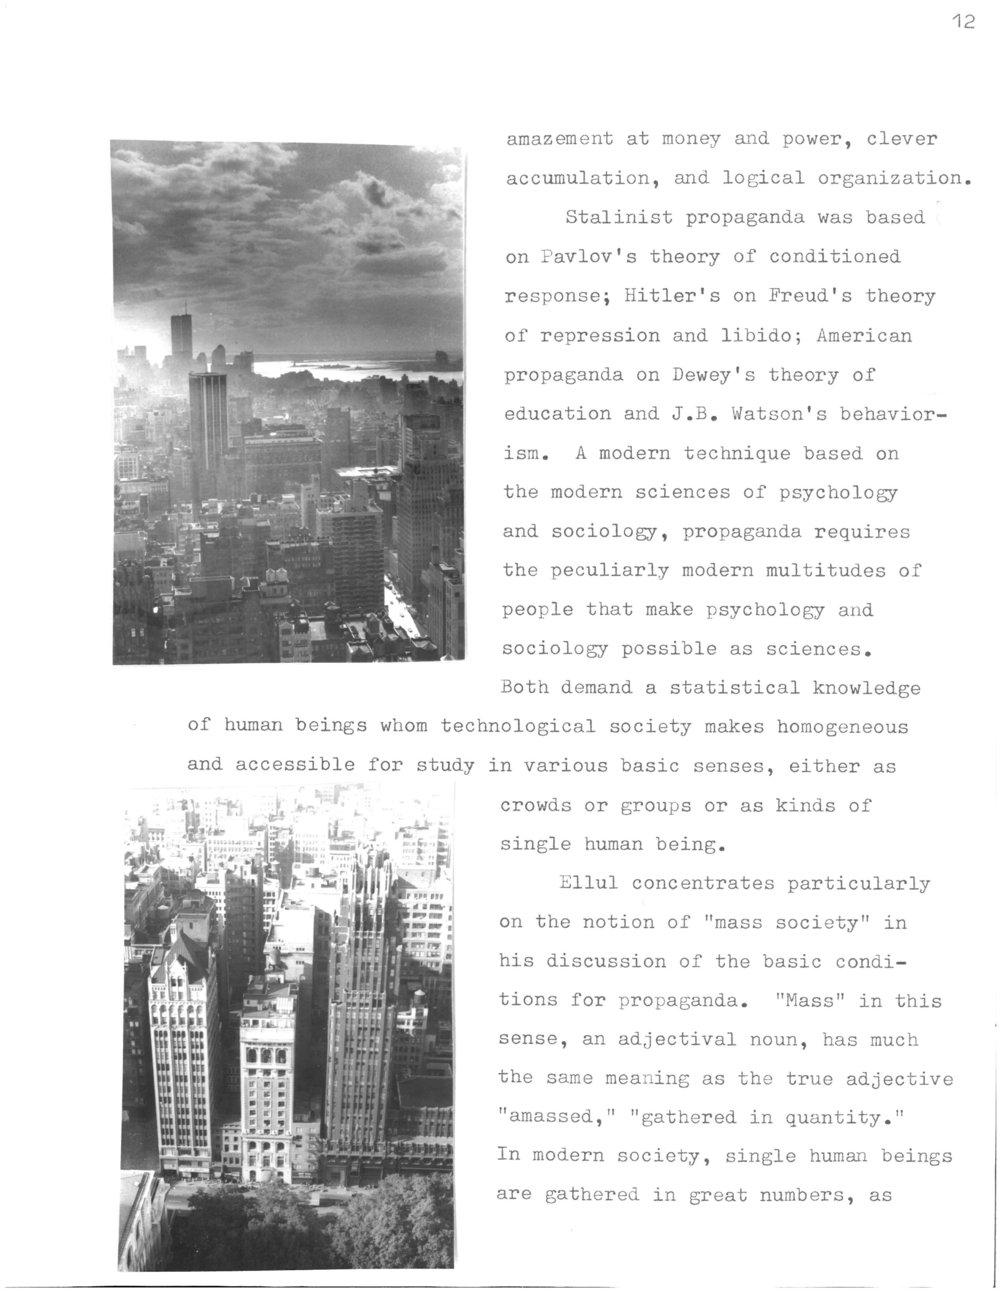 Propaganda_Page_14.jpg